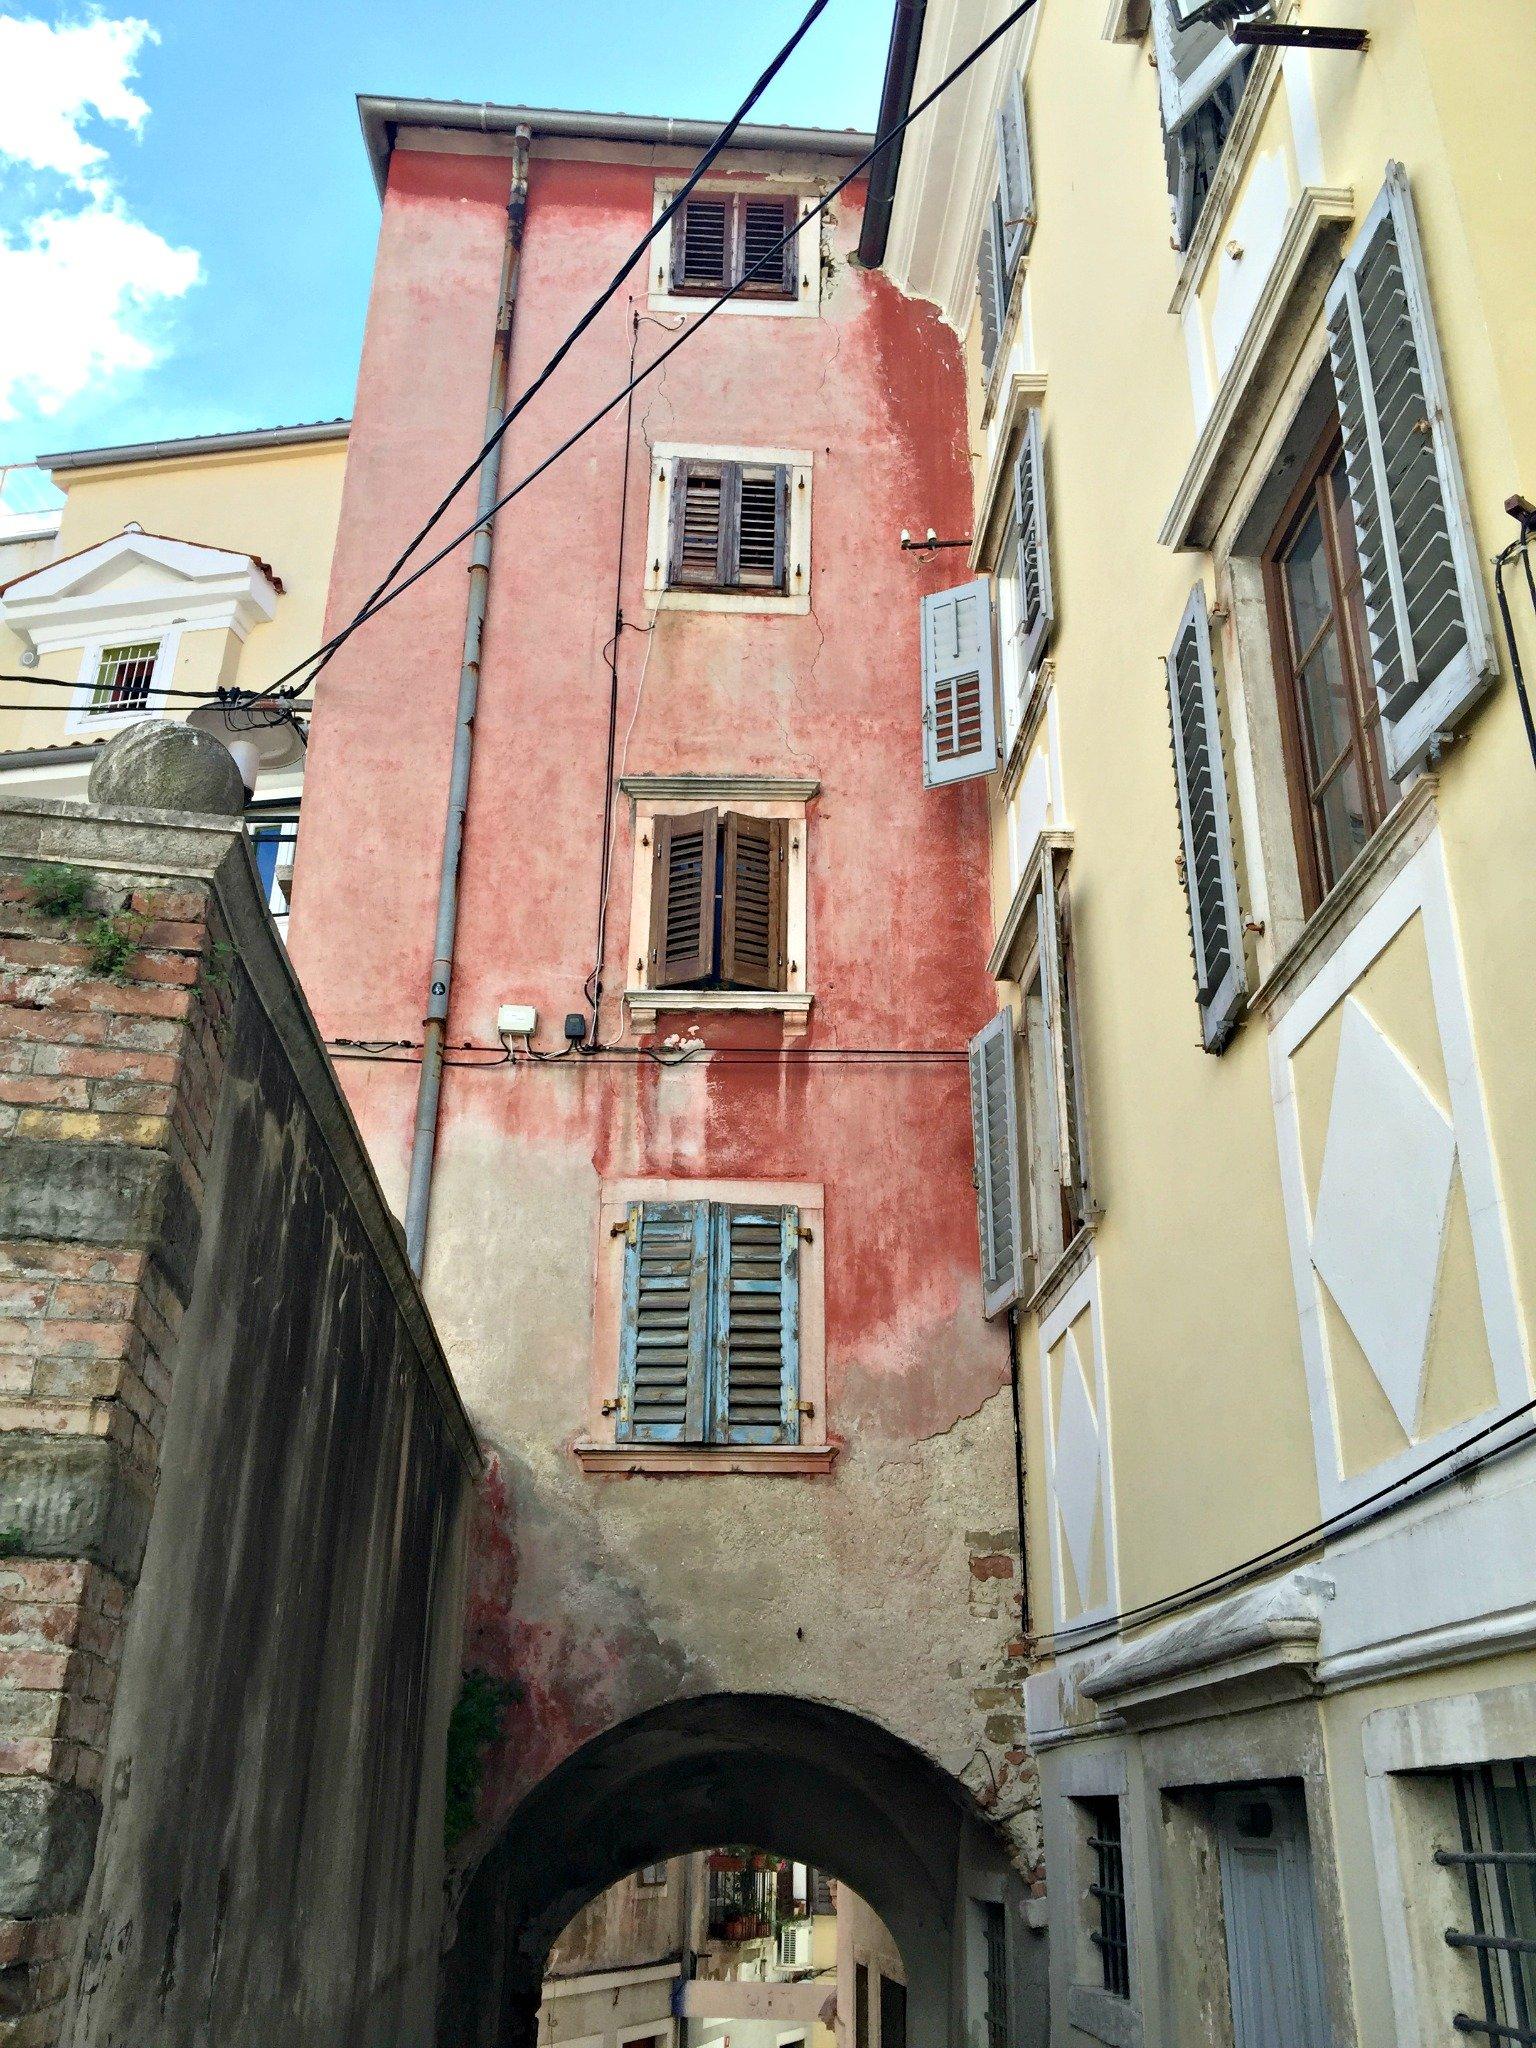 Exploring the winding backlanes of Piran